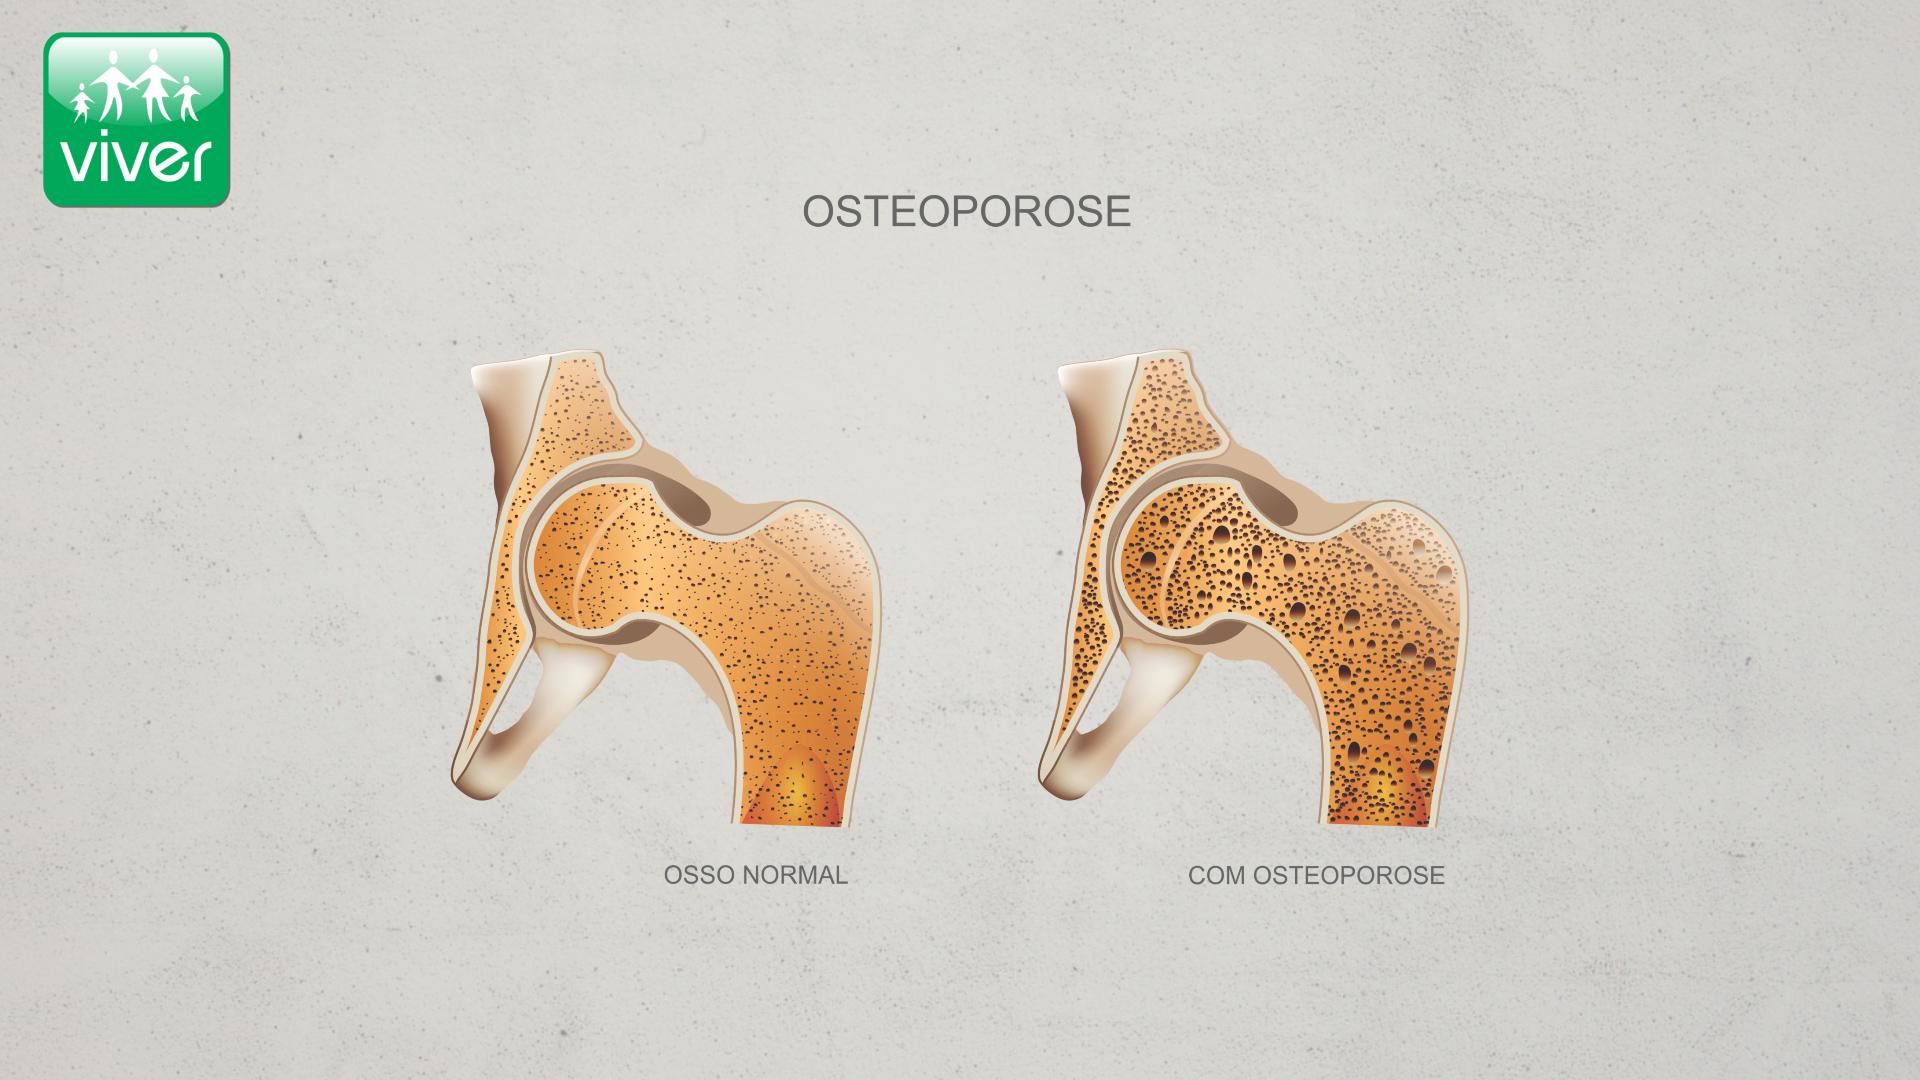 Osteoporose - Densidade Mineral Óssea (DMO) Diminuída